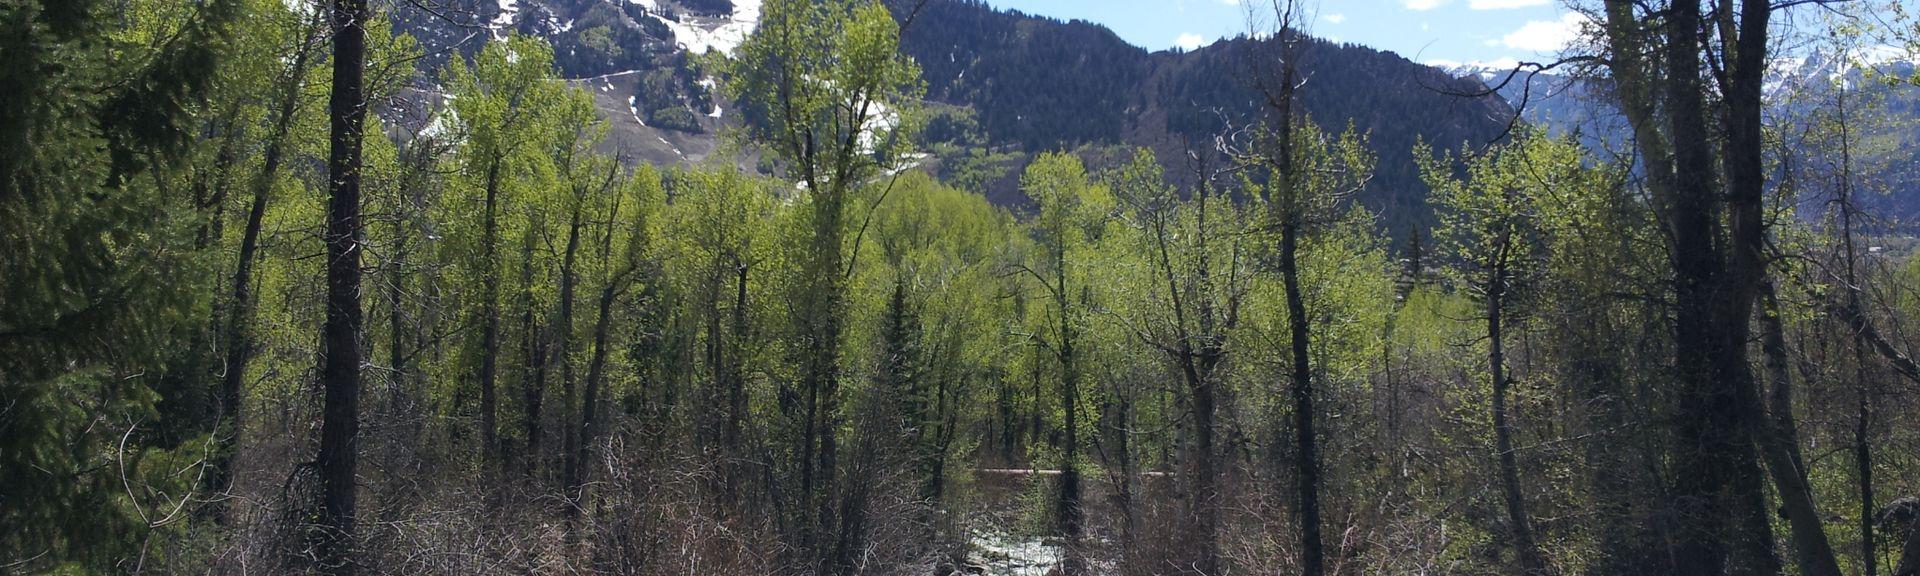 Aspen Mountain, Aspen, Colorado, United States